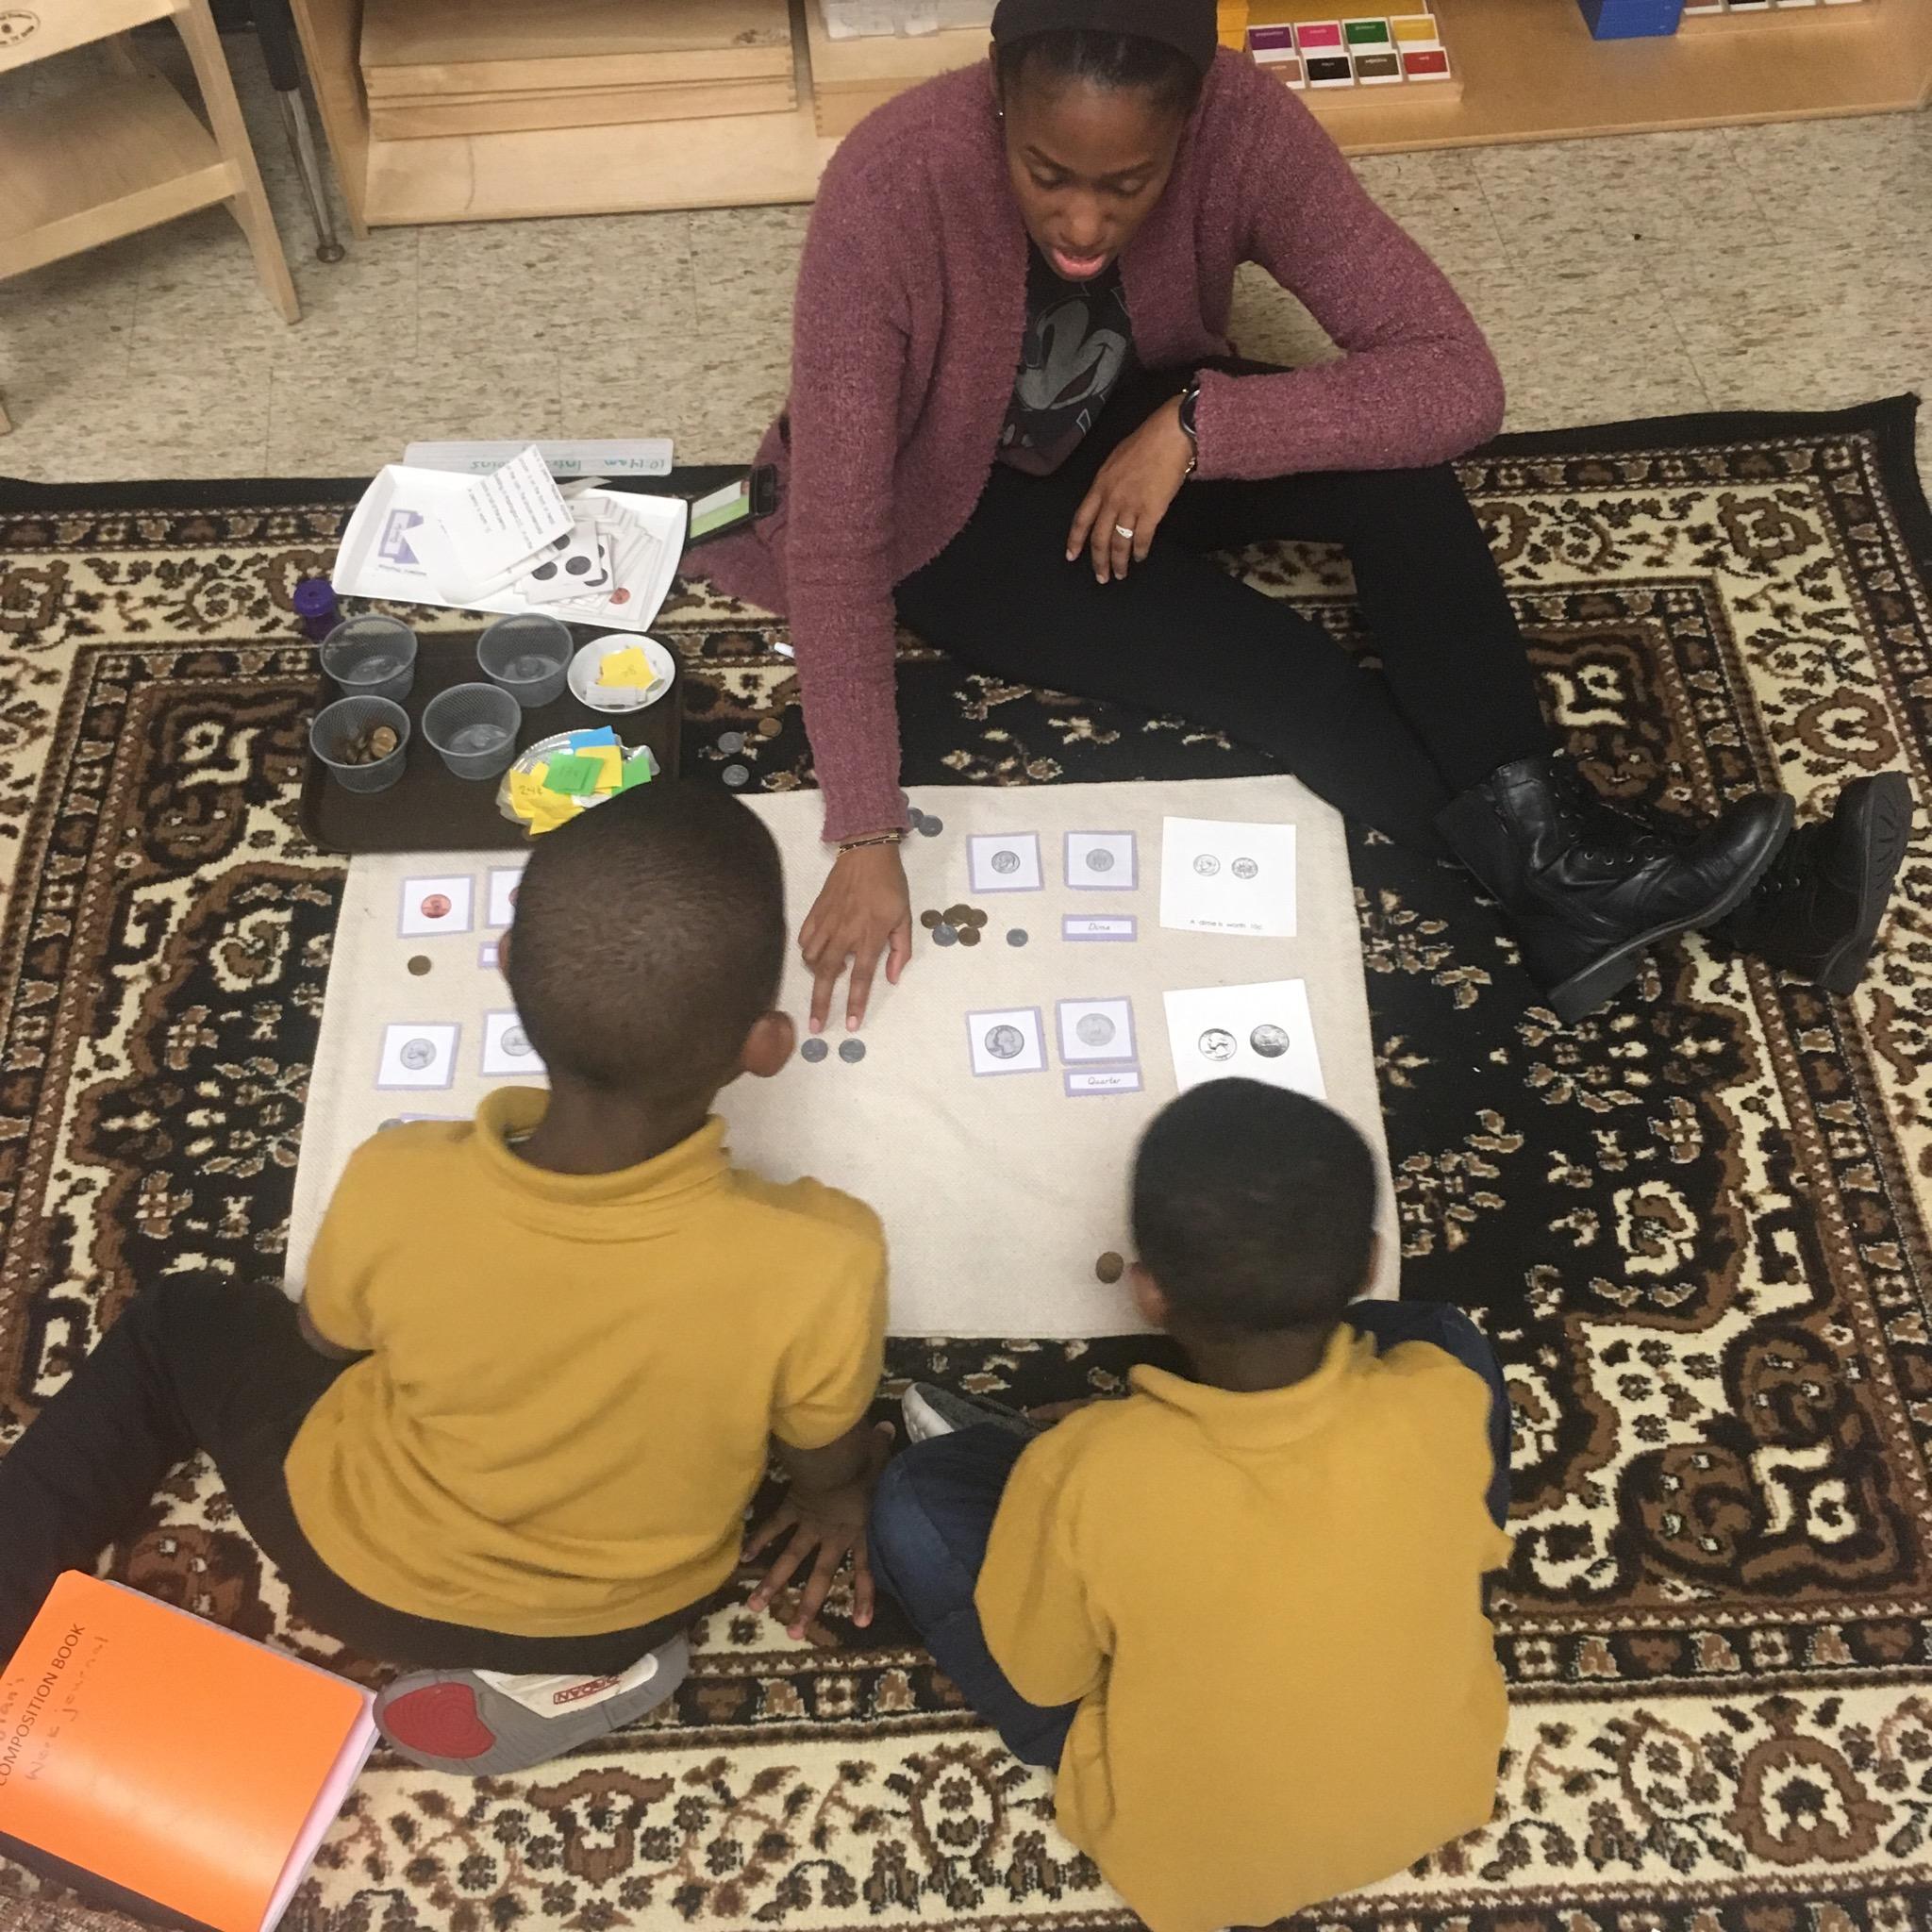 michaela joshua teaching math.JPG